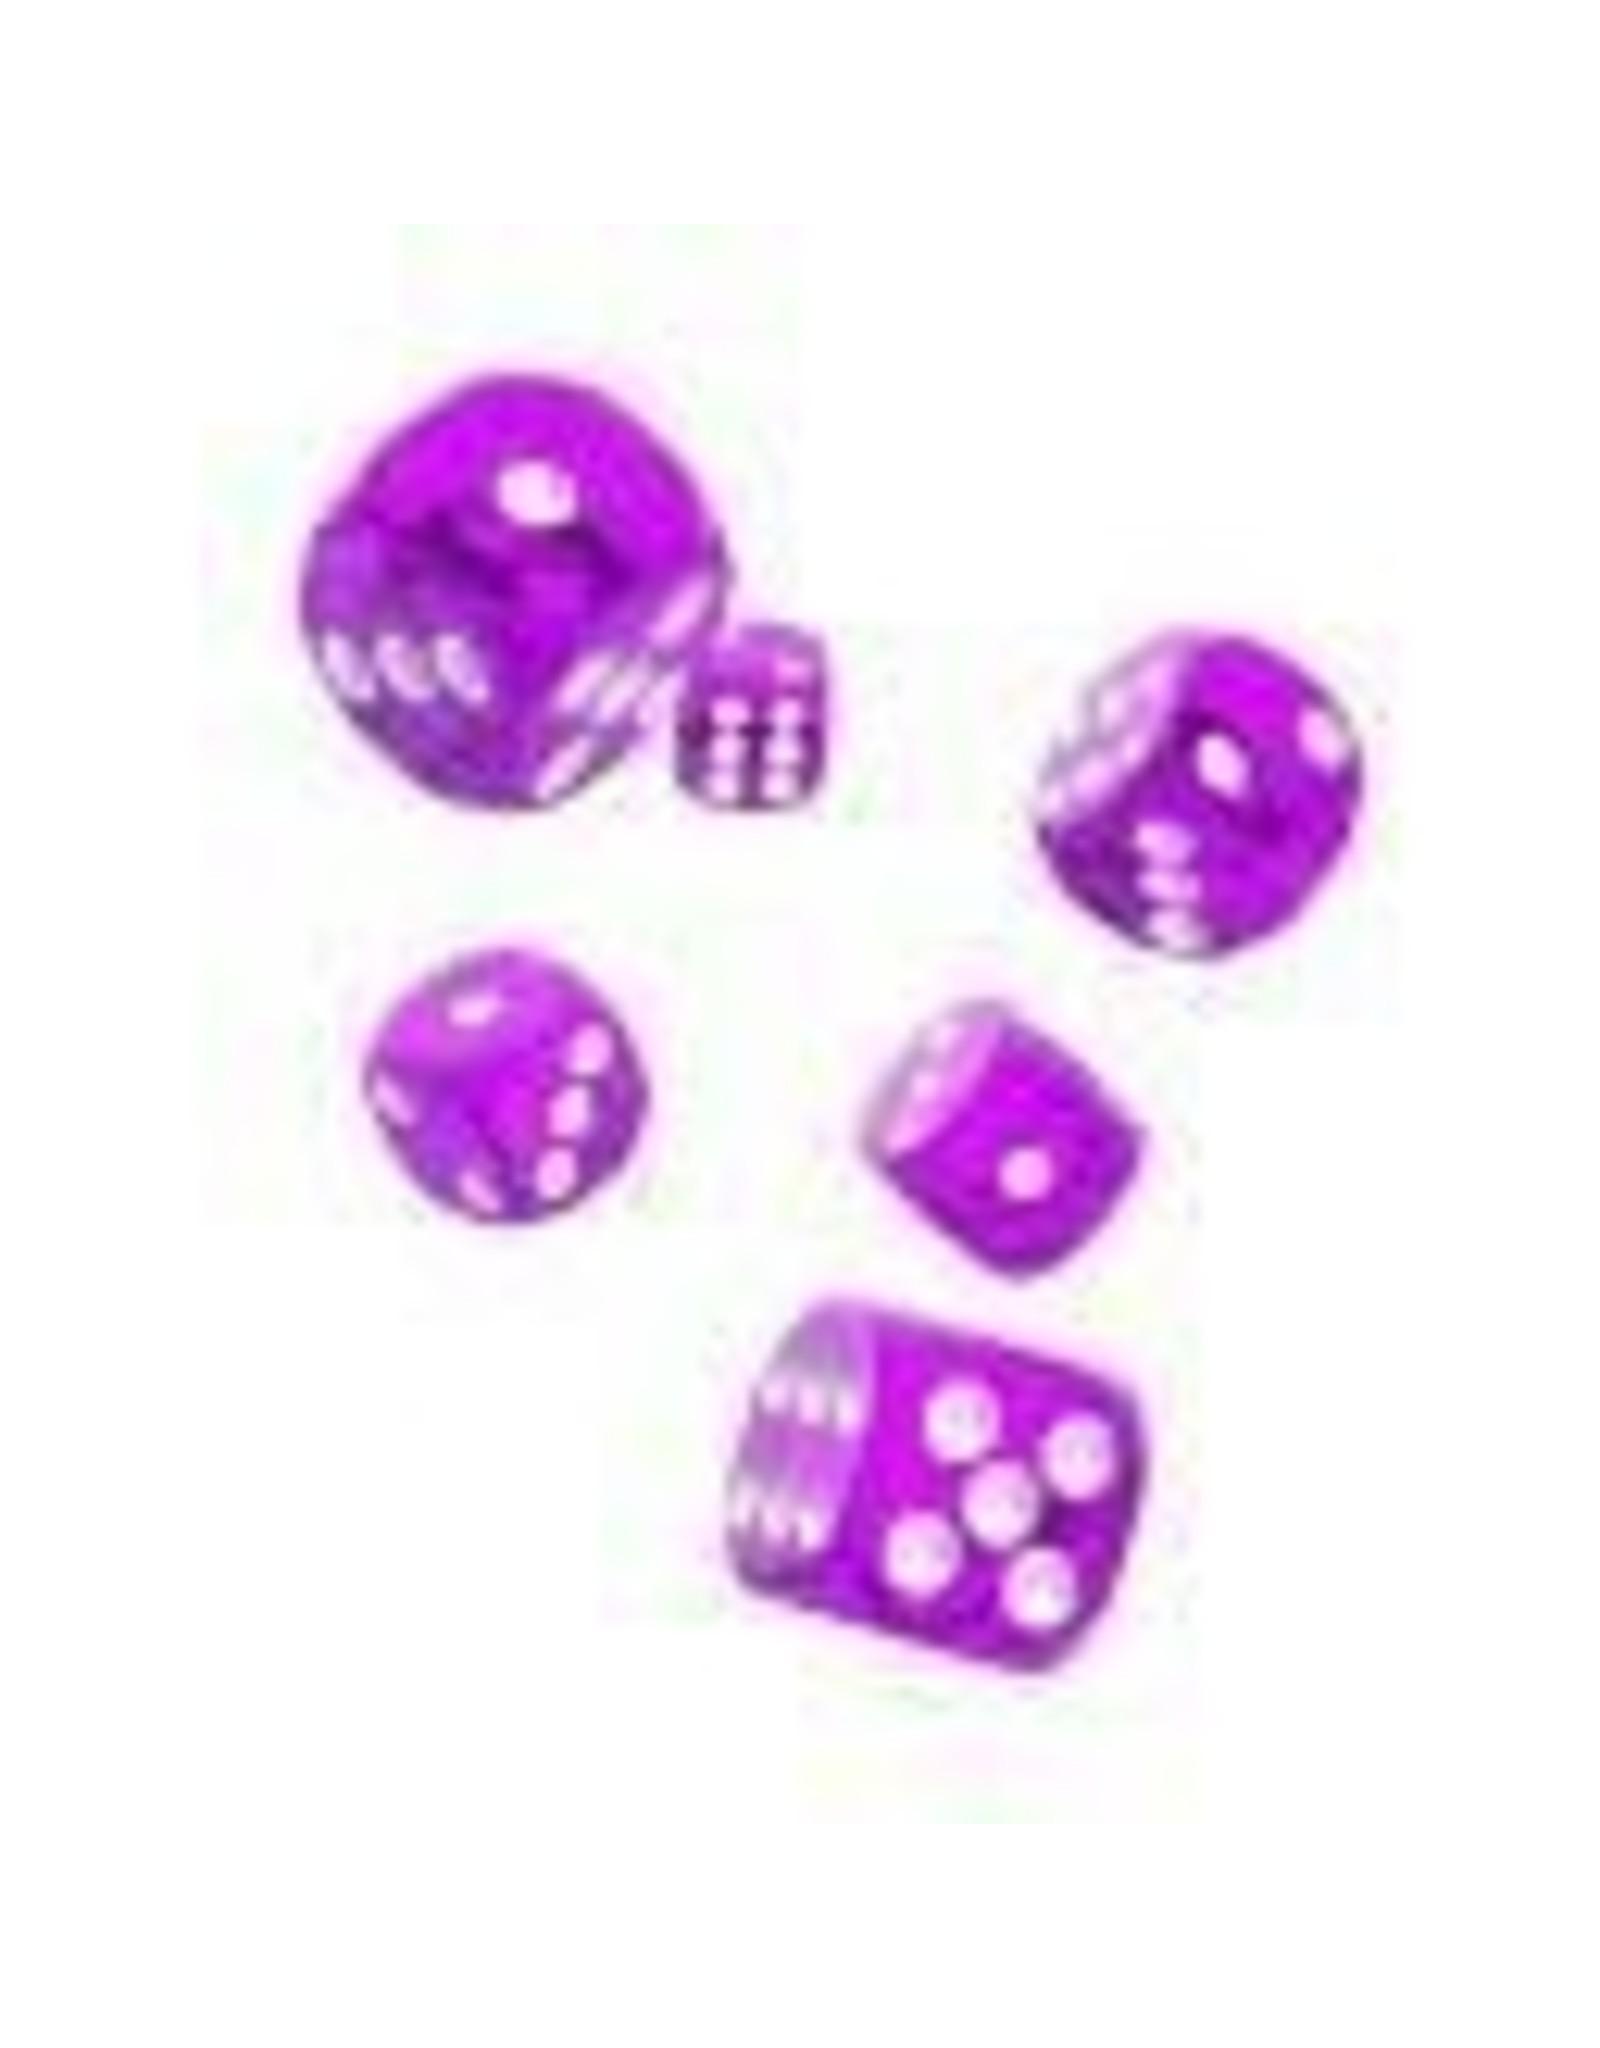 Oakie Doakie Dice G12 OK d6 12mm Translucent Purple